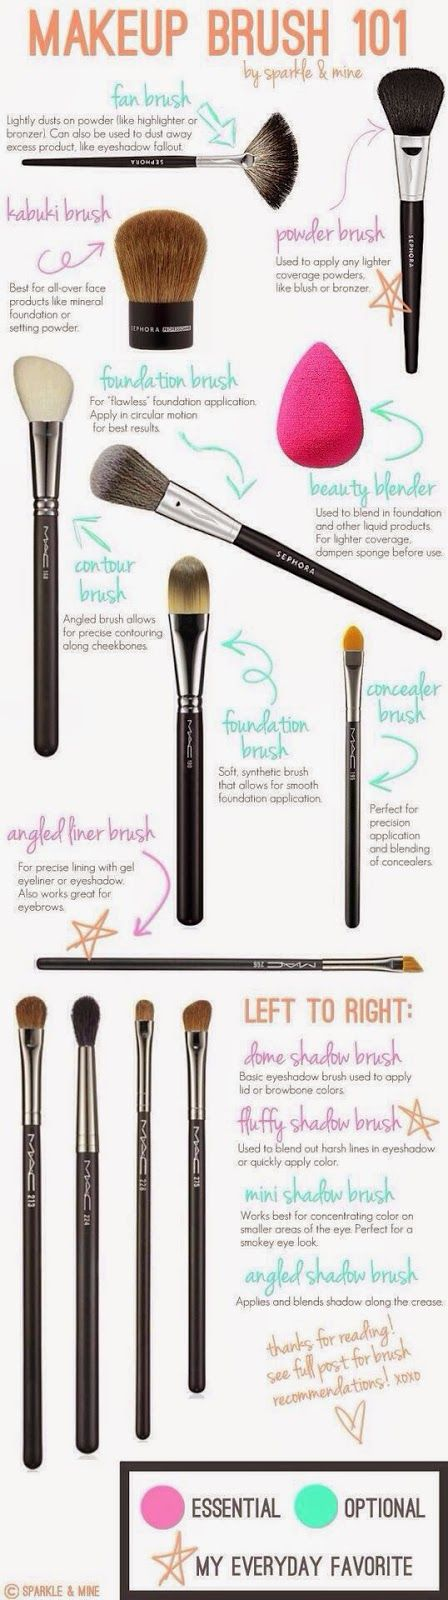 Chantel Bernal Beauty: Makeup Brush 101